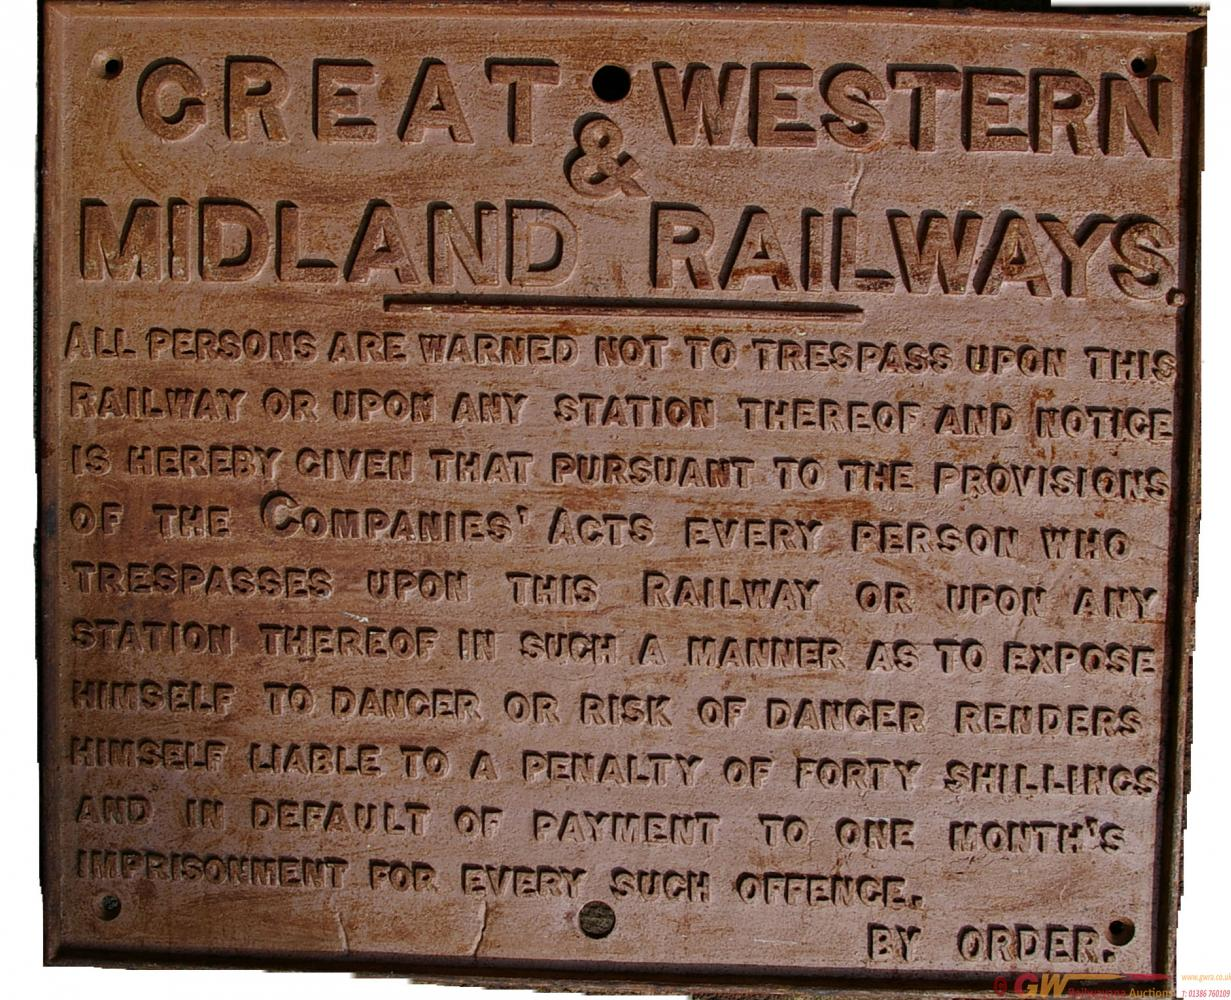 Great Western & Midland Railway Joint C/I Trespass